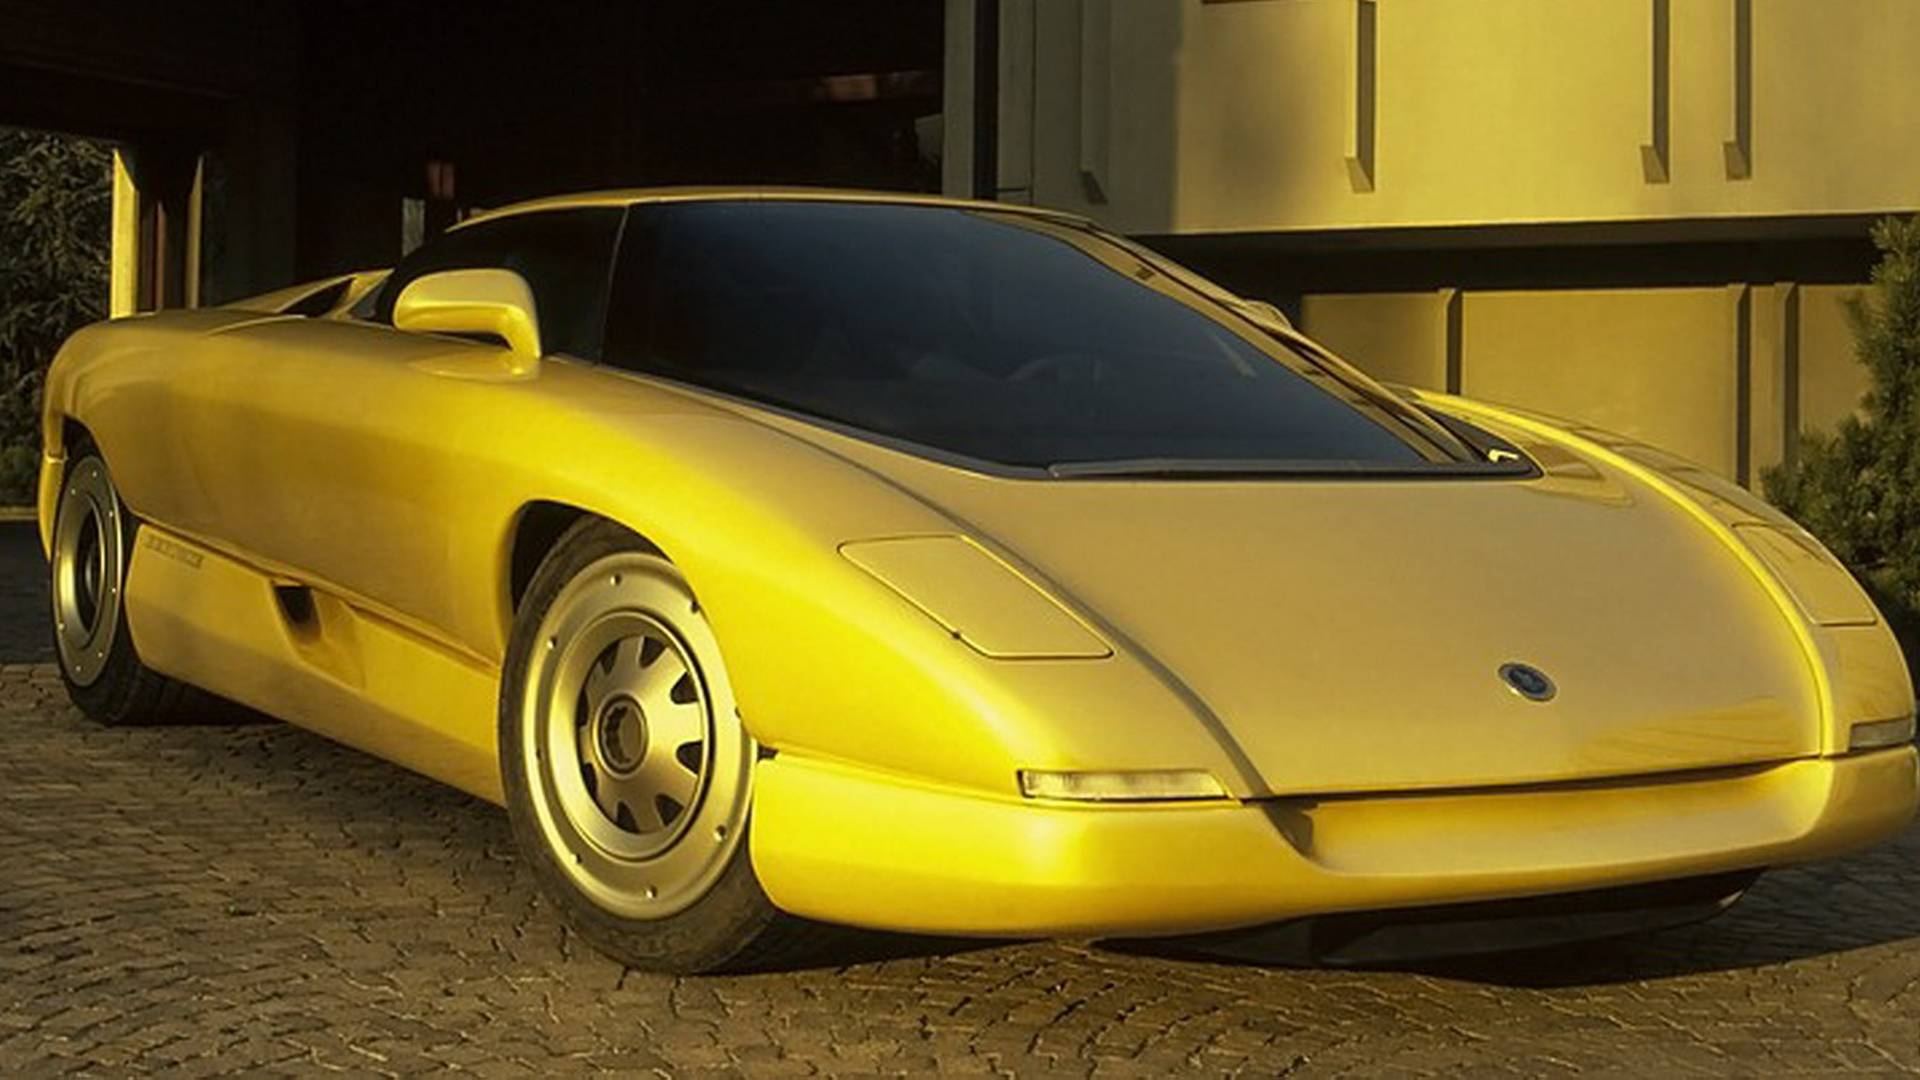 1990 Bertone Nivola concept 3/4 front low